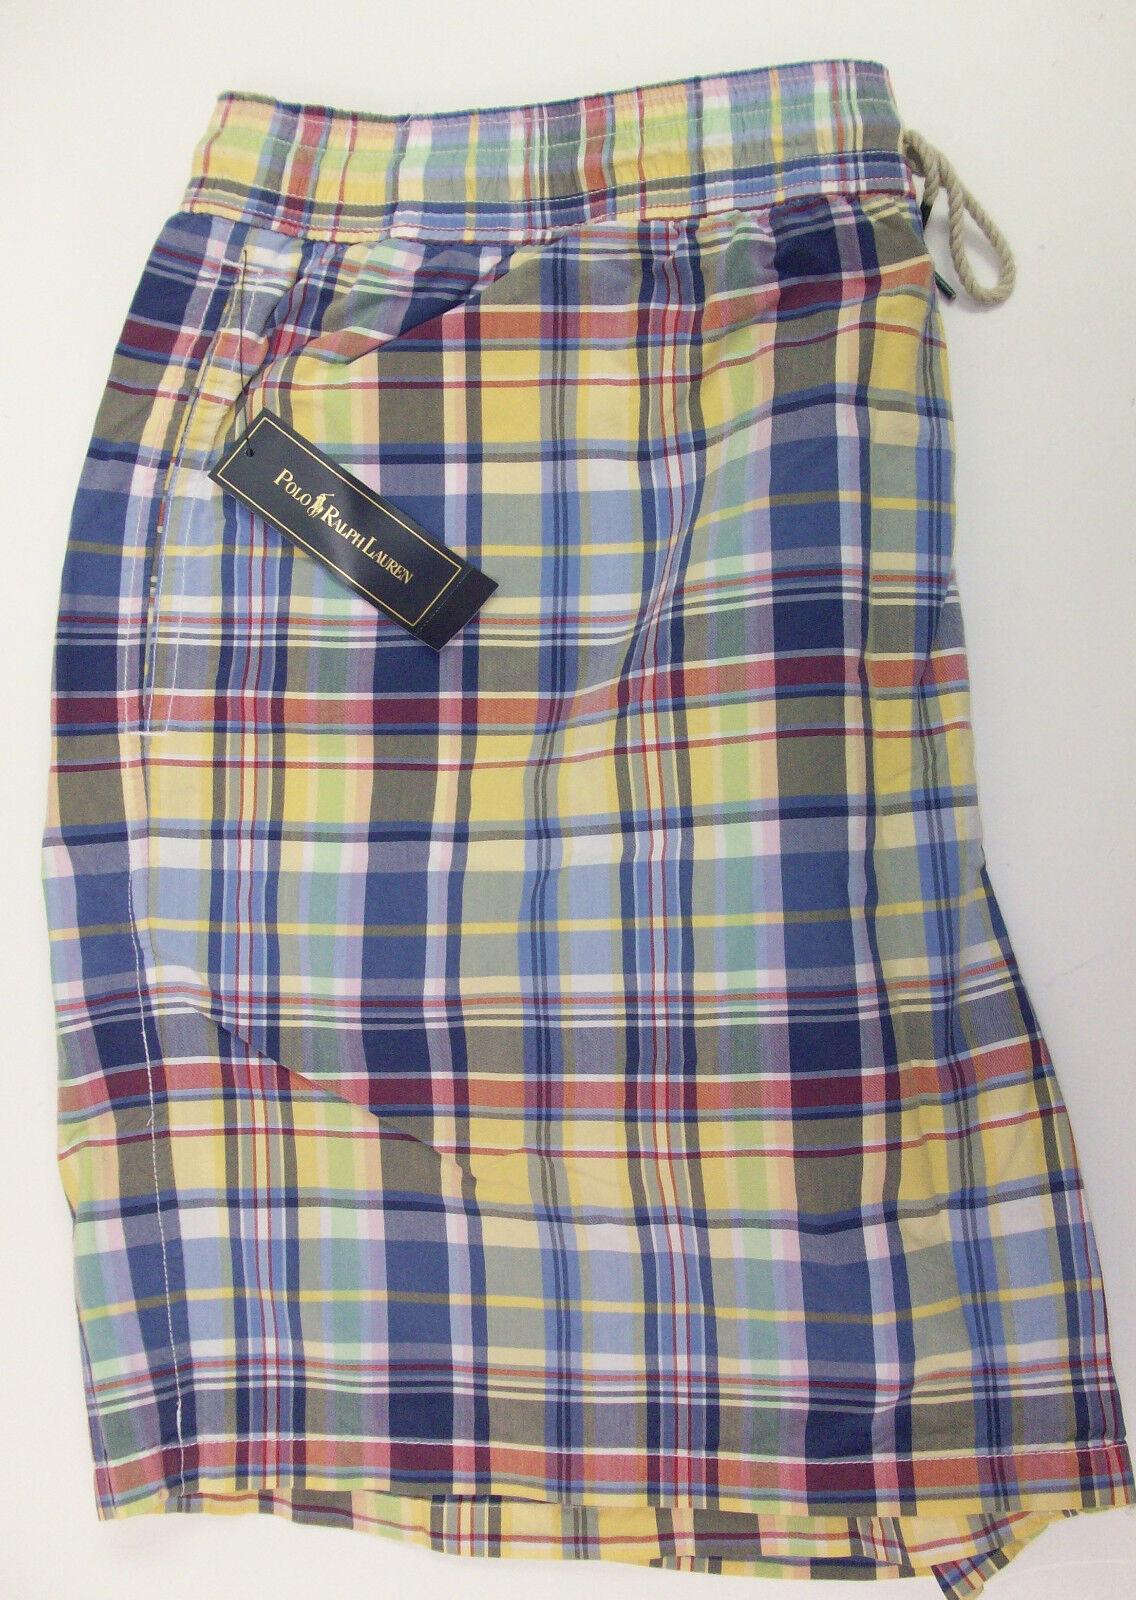 Polo Ralph Lauren Hawaiian Swimwear Trunks Shorts  bluee Yellow Pink Plaid NWT